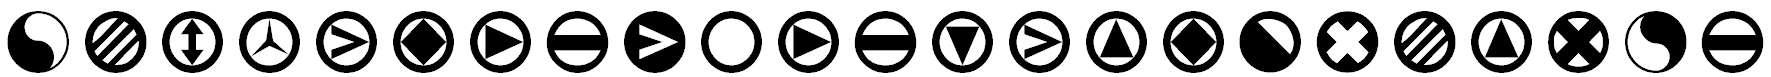 LinotypeTapestry-Circle